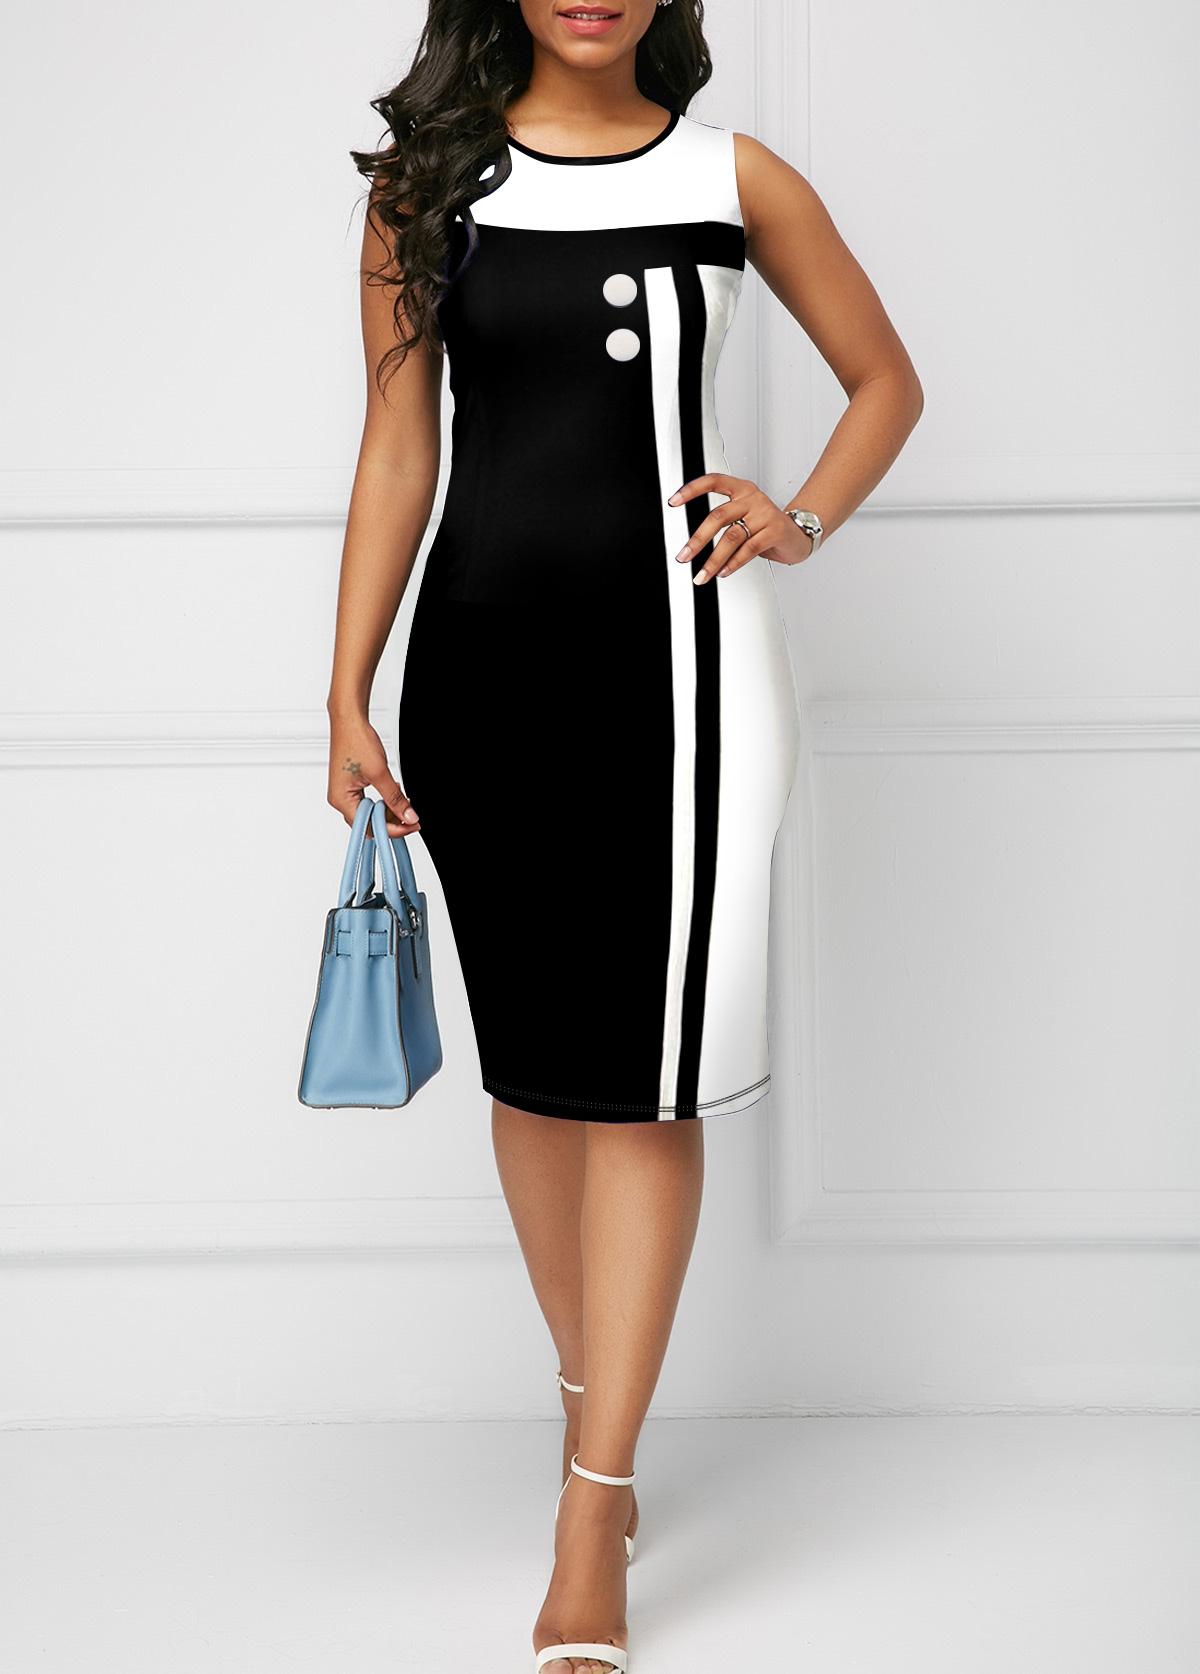 ROTITA Sleeveless Round Neck Contrast Bodycon Dress